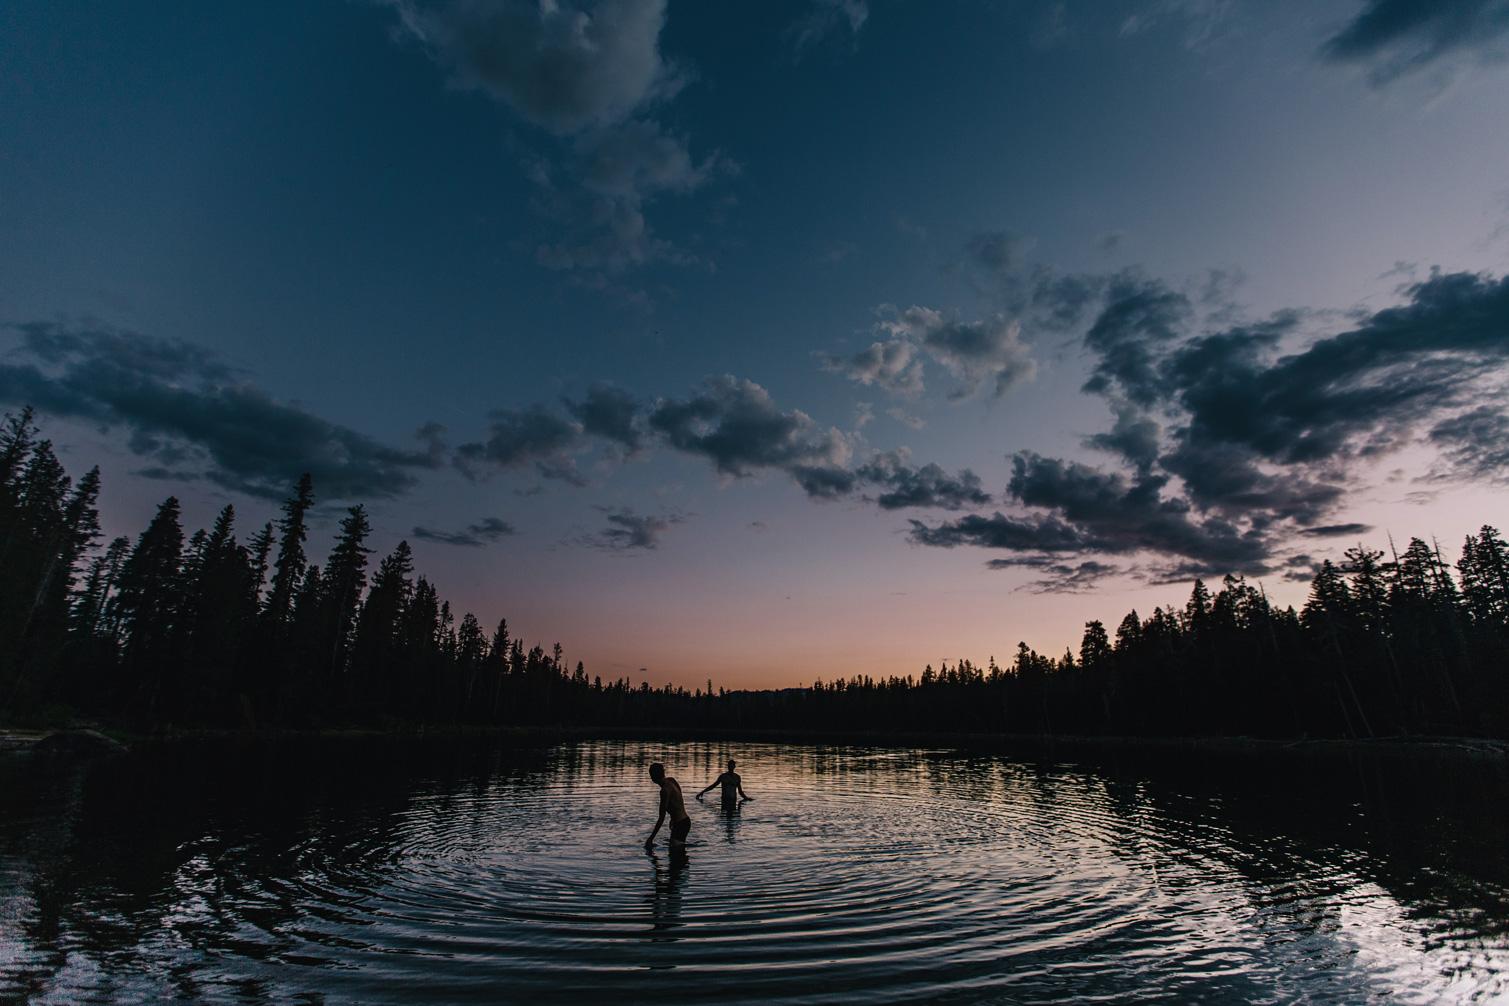 CindyGiovagnoli_outdoors_photographer_Sierra_Buttes_firetower_watchtower_Sardine_Snag_Bear_lake_hike_swim_camp-044.jpg